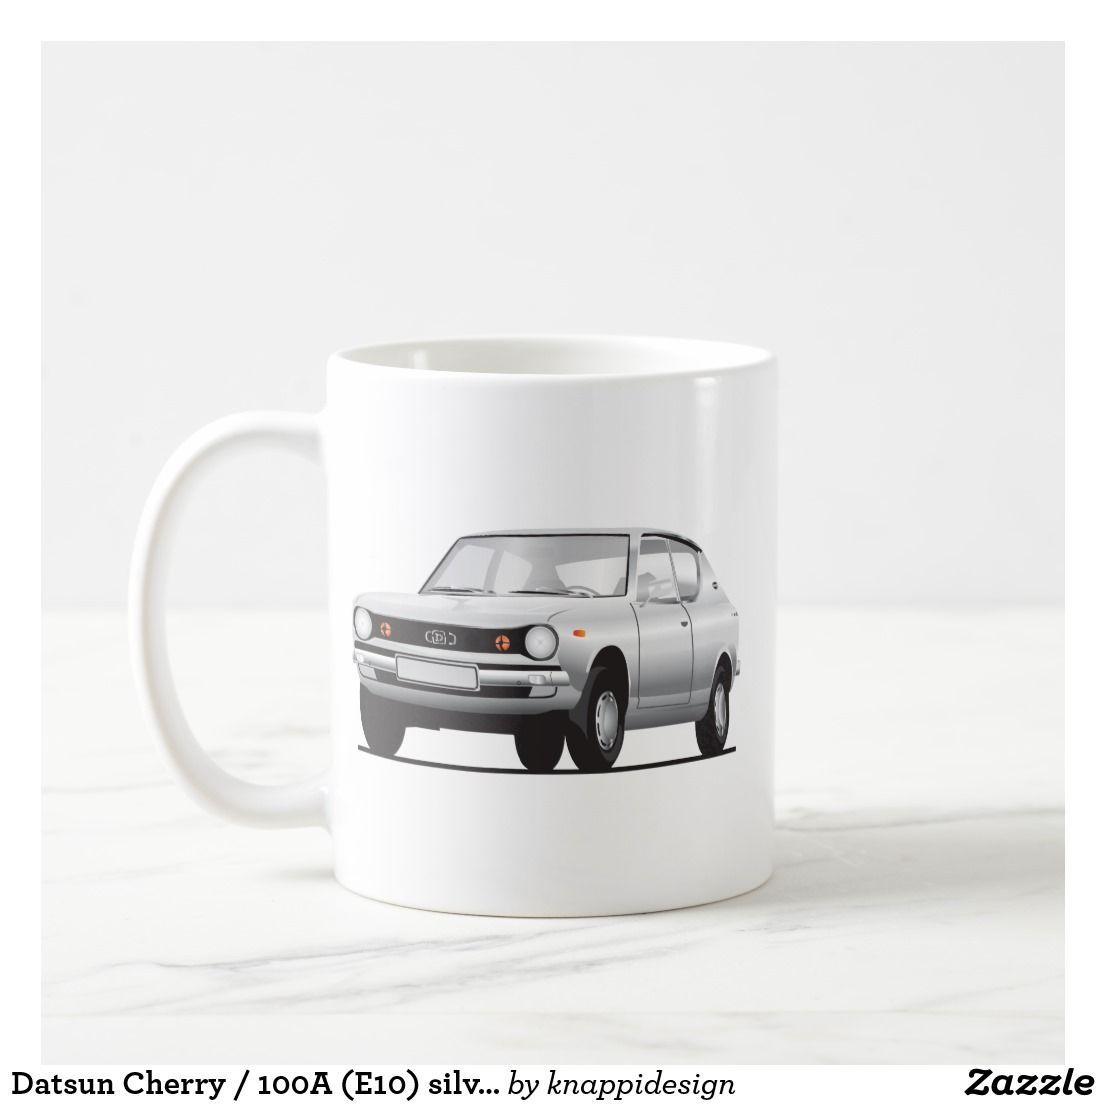 Datsun Cherry / 100A (E10) silver two images per coffee mug.  #datsun #datsuncherry #datsun100A #datsun #datsune10 #70s #1970s #japan #japanese #automobile #cars #classiccars #carillustrations #silver #smallcar #coffeemug #kaffamugg #muki #auto #cherry